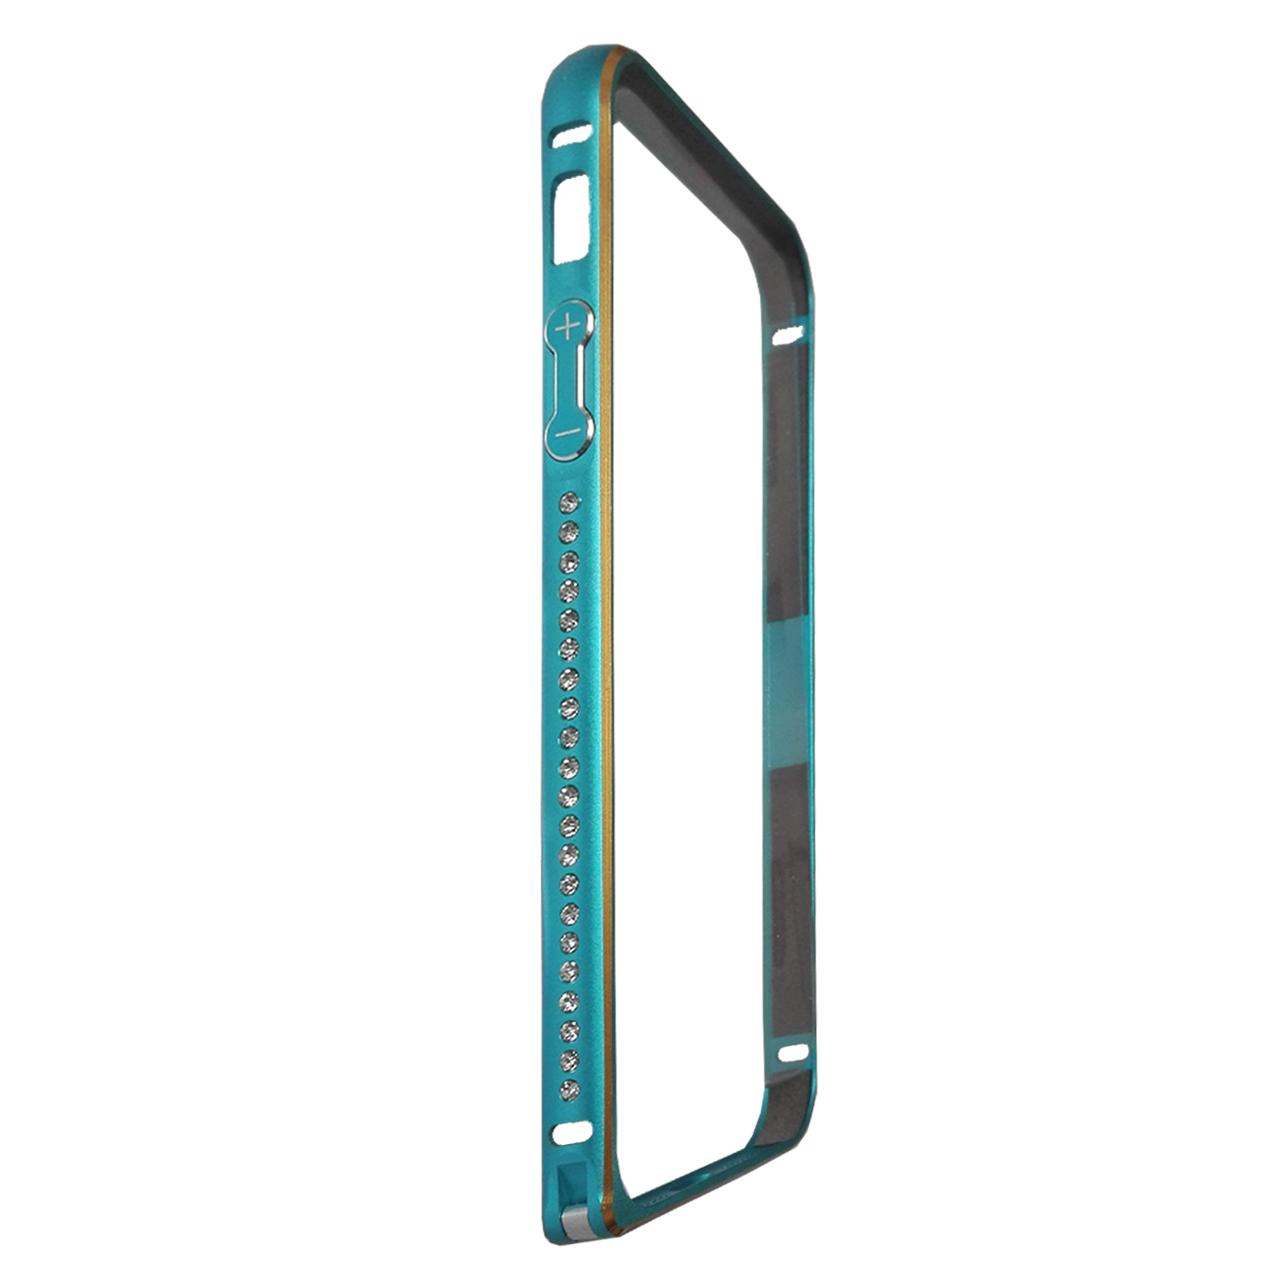 بامپر مدل Fashion Case مناسب گوشی موبایل اپل iPhone 5/5s